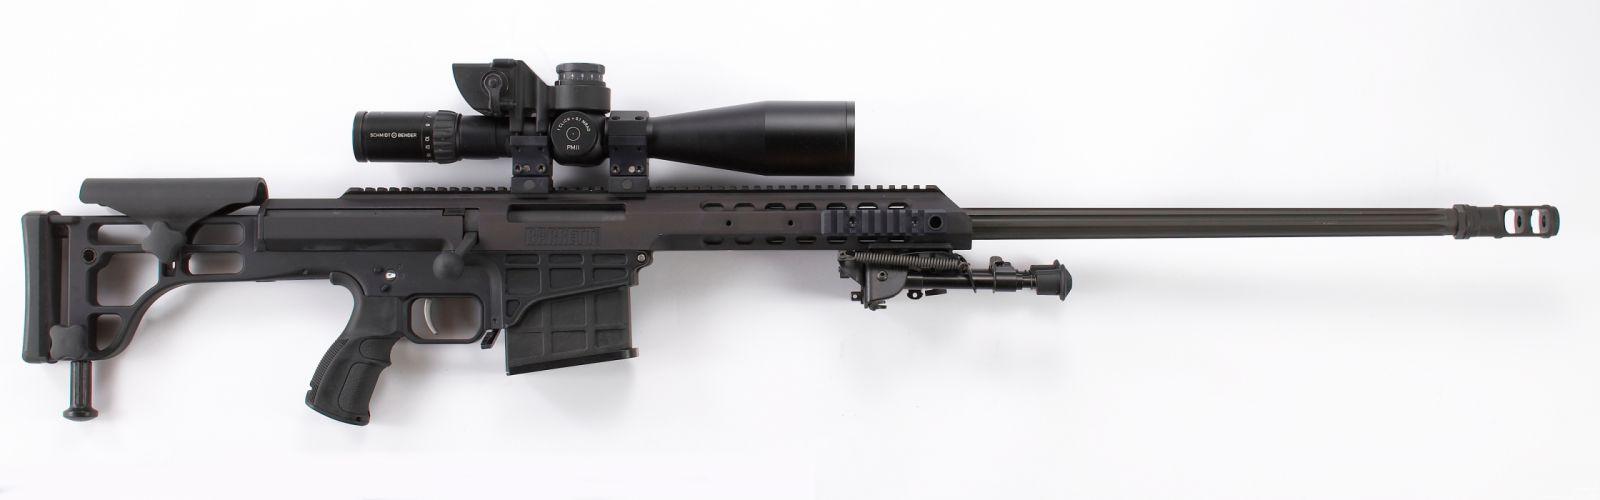 guns weapons sniper rifles M98 Bravo wallpaper